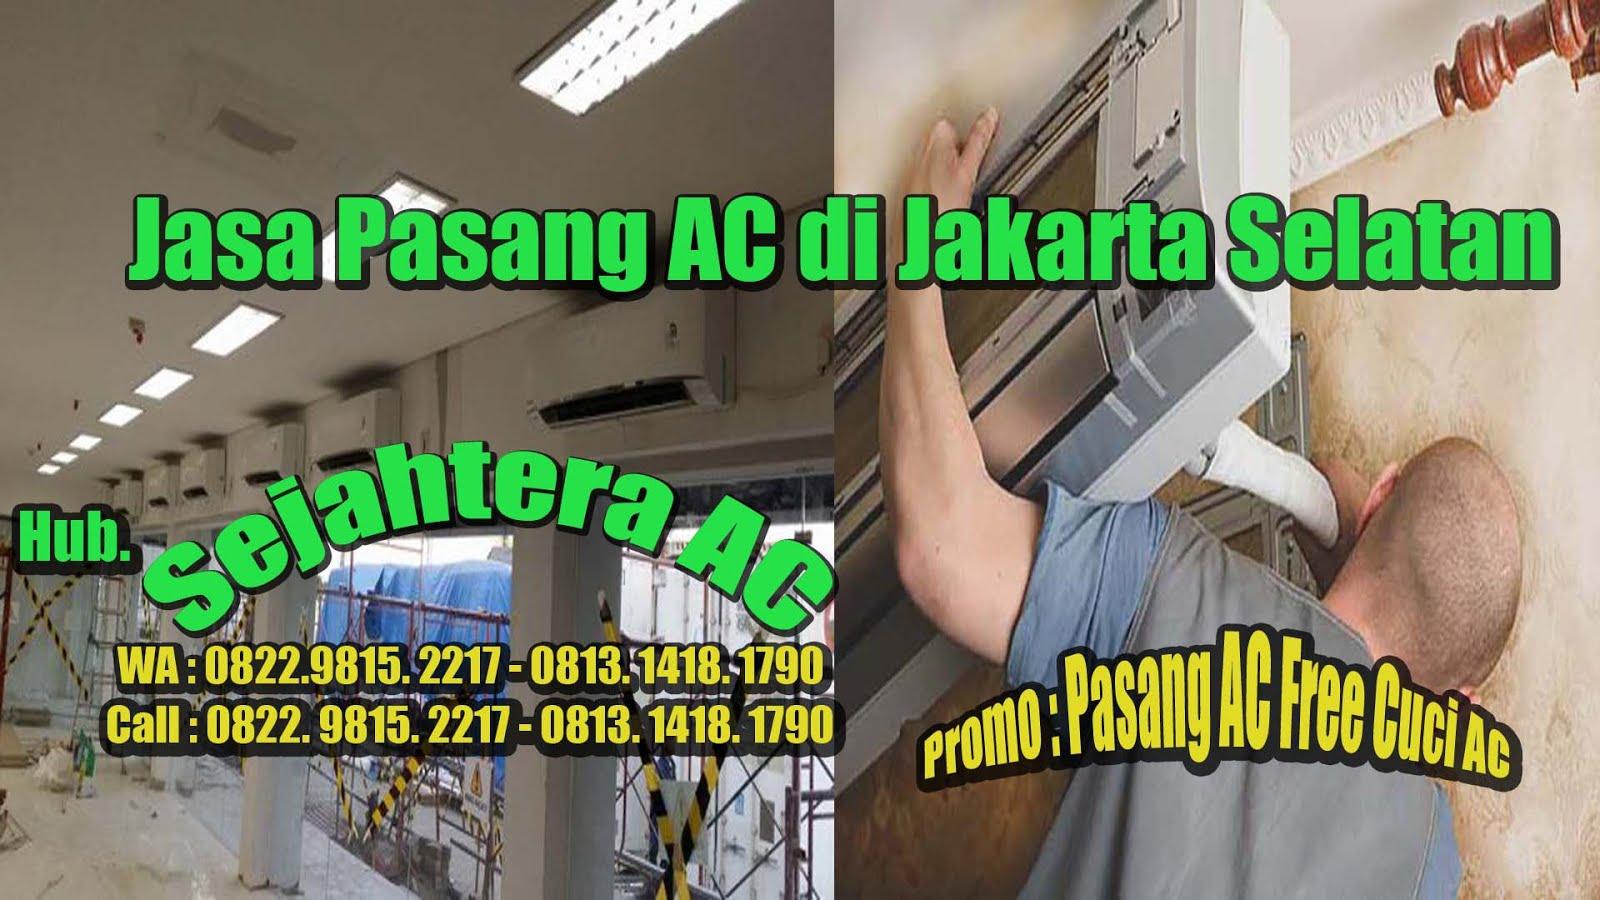 Jasa Pasang AC di Jakarta Selatan